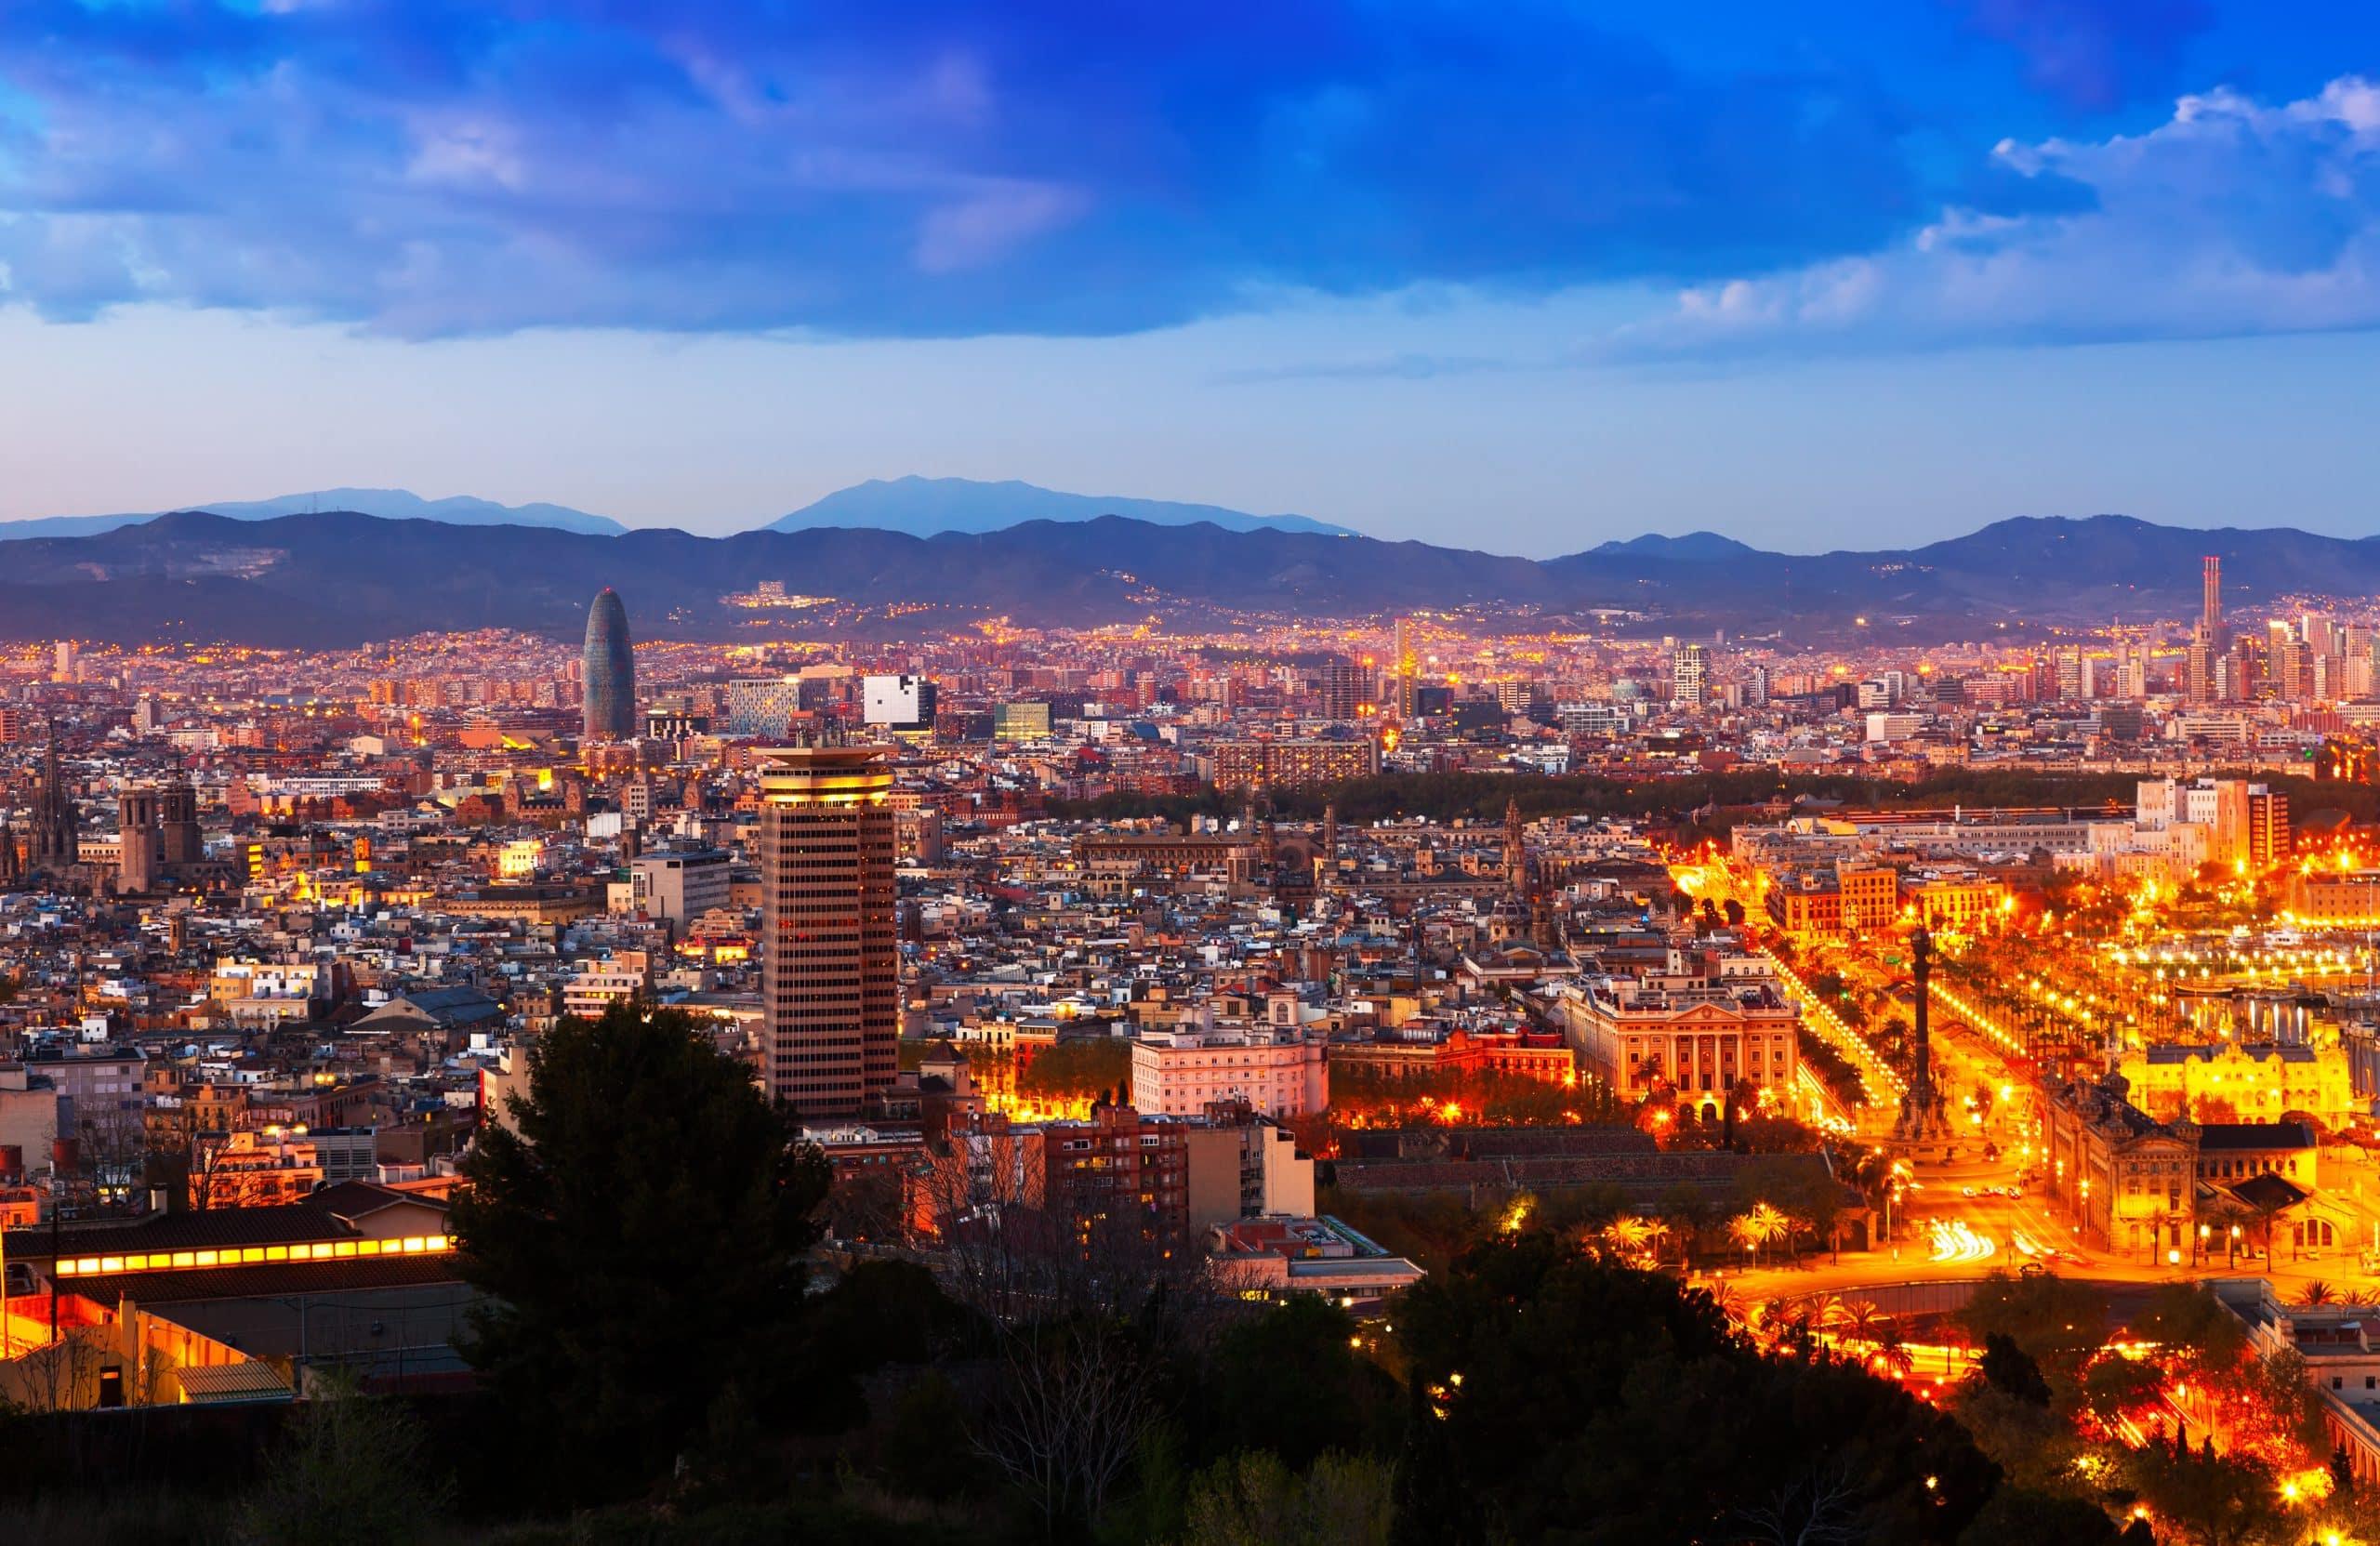 mejores zonas para vivir en Barcelona